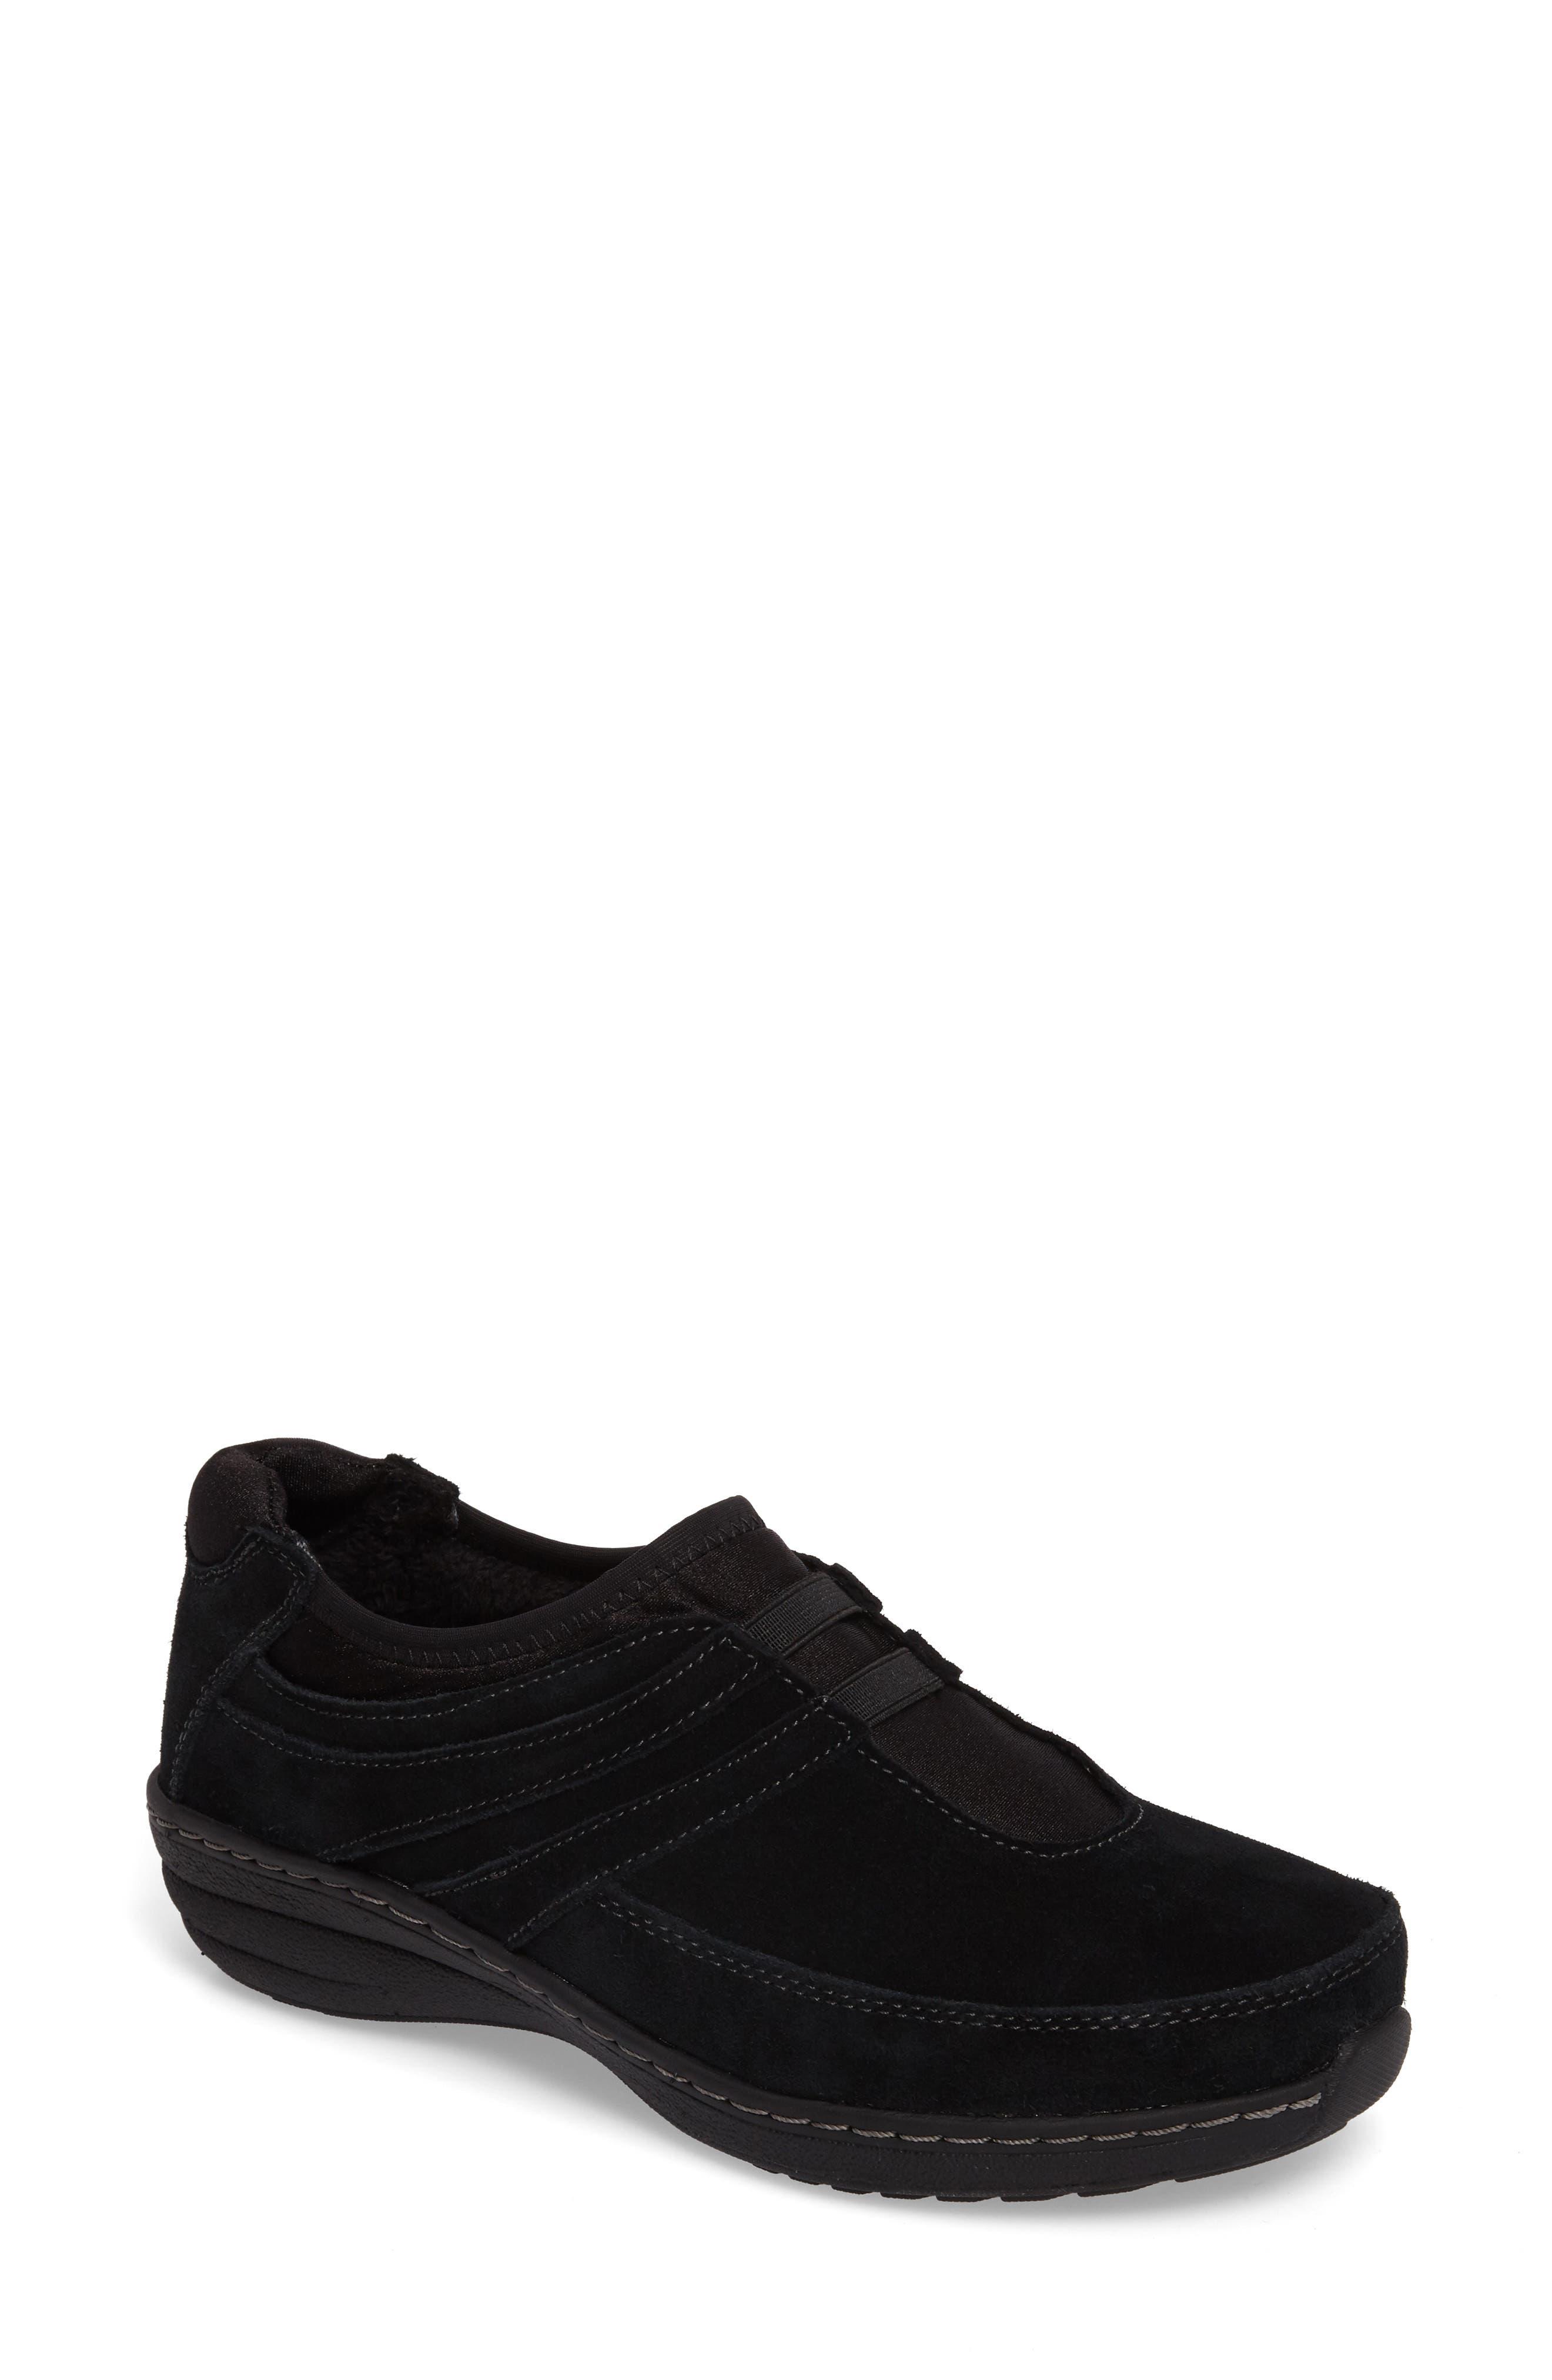 Main Image - Aetrex Berries Slip-On Sneaker (Women)